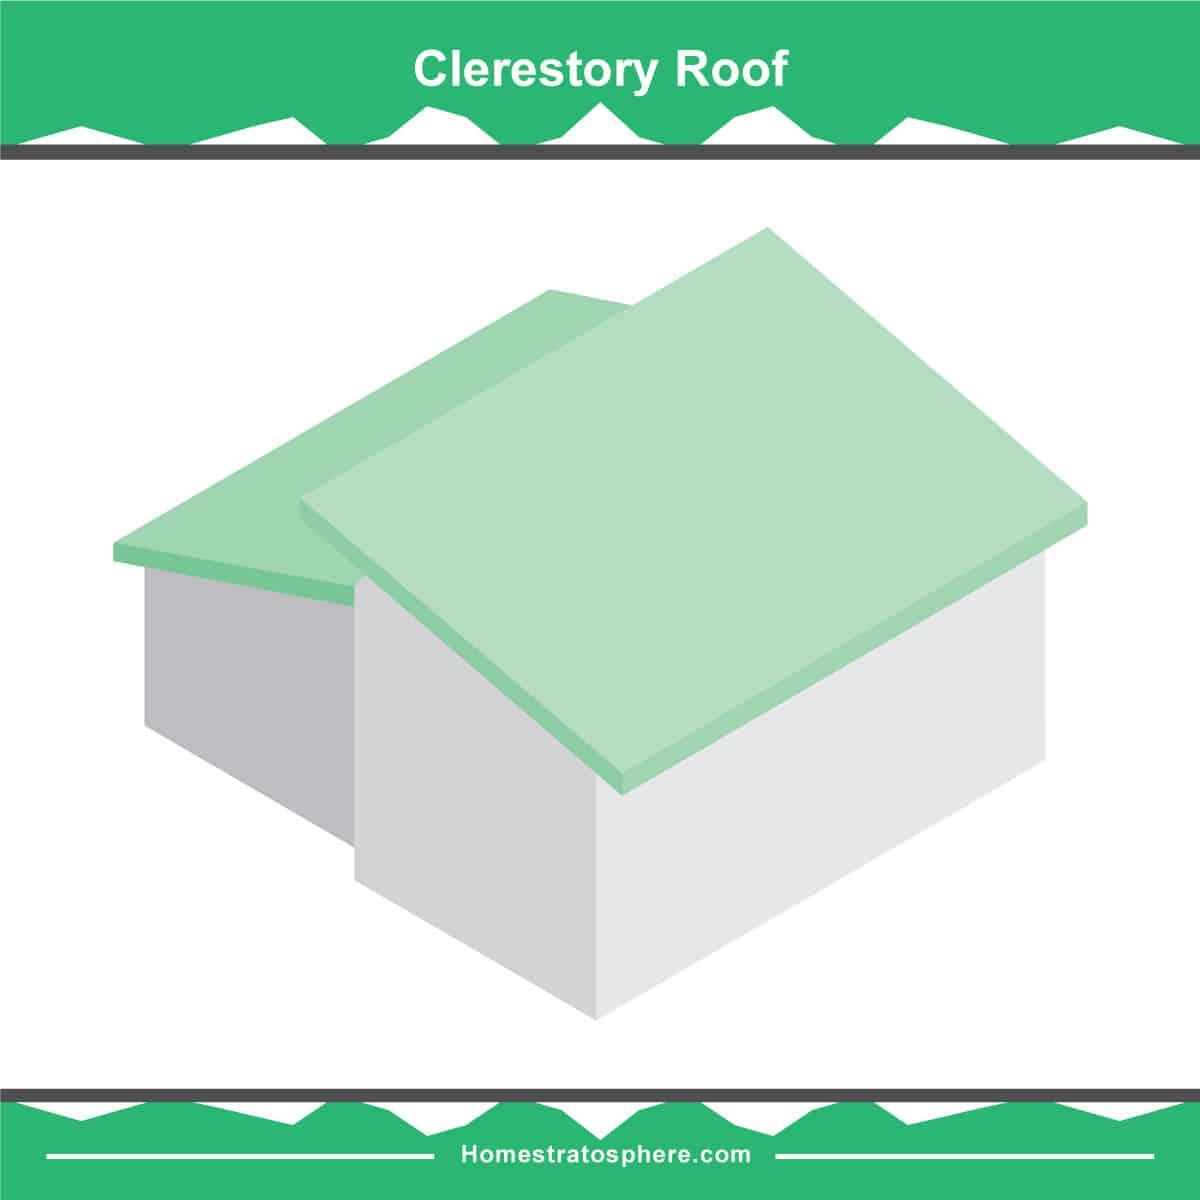 Clerestory roof diagram